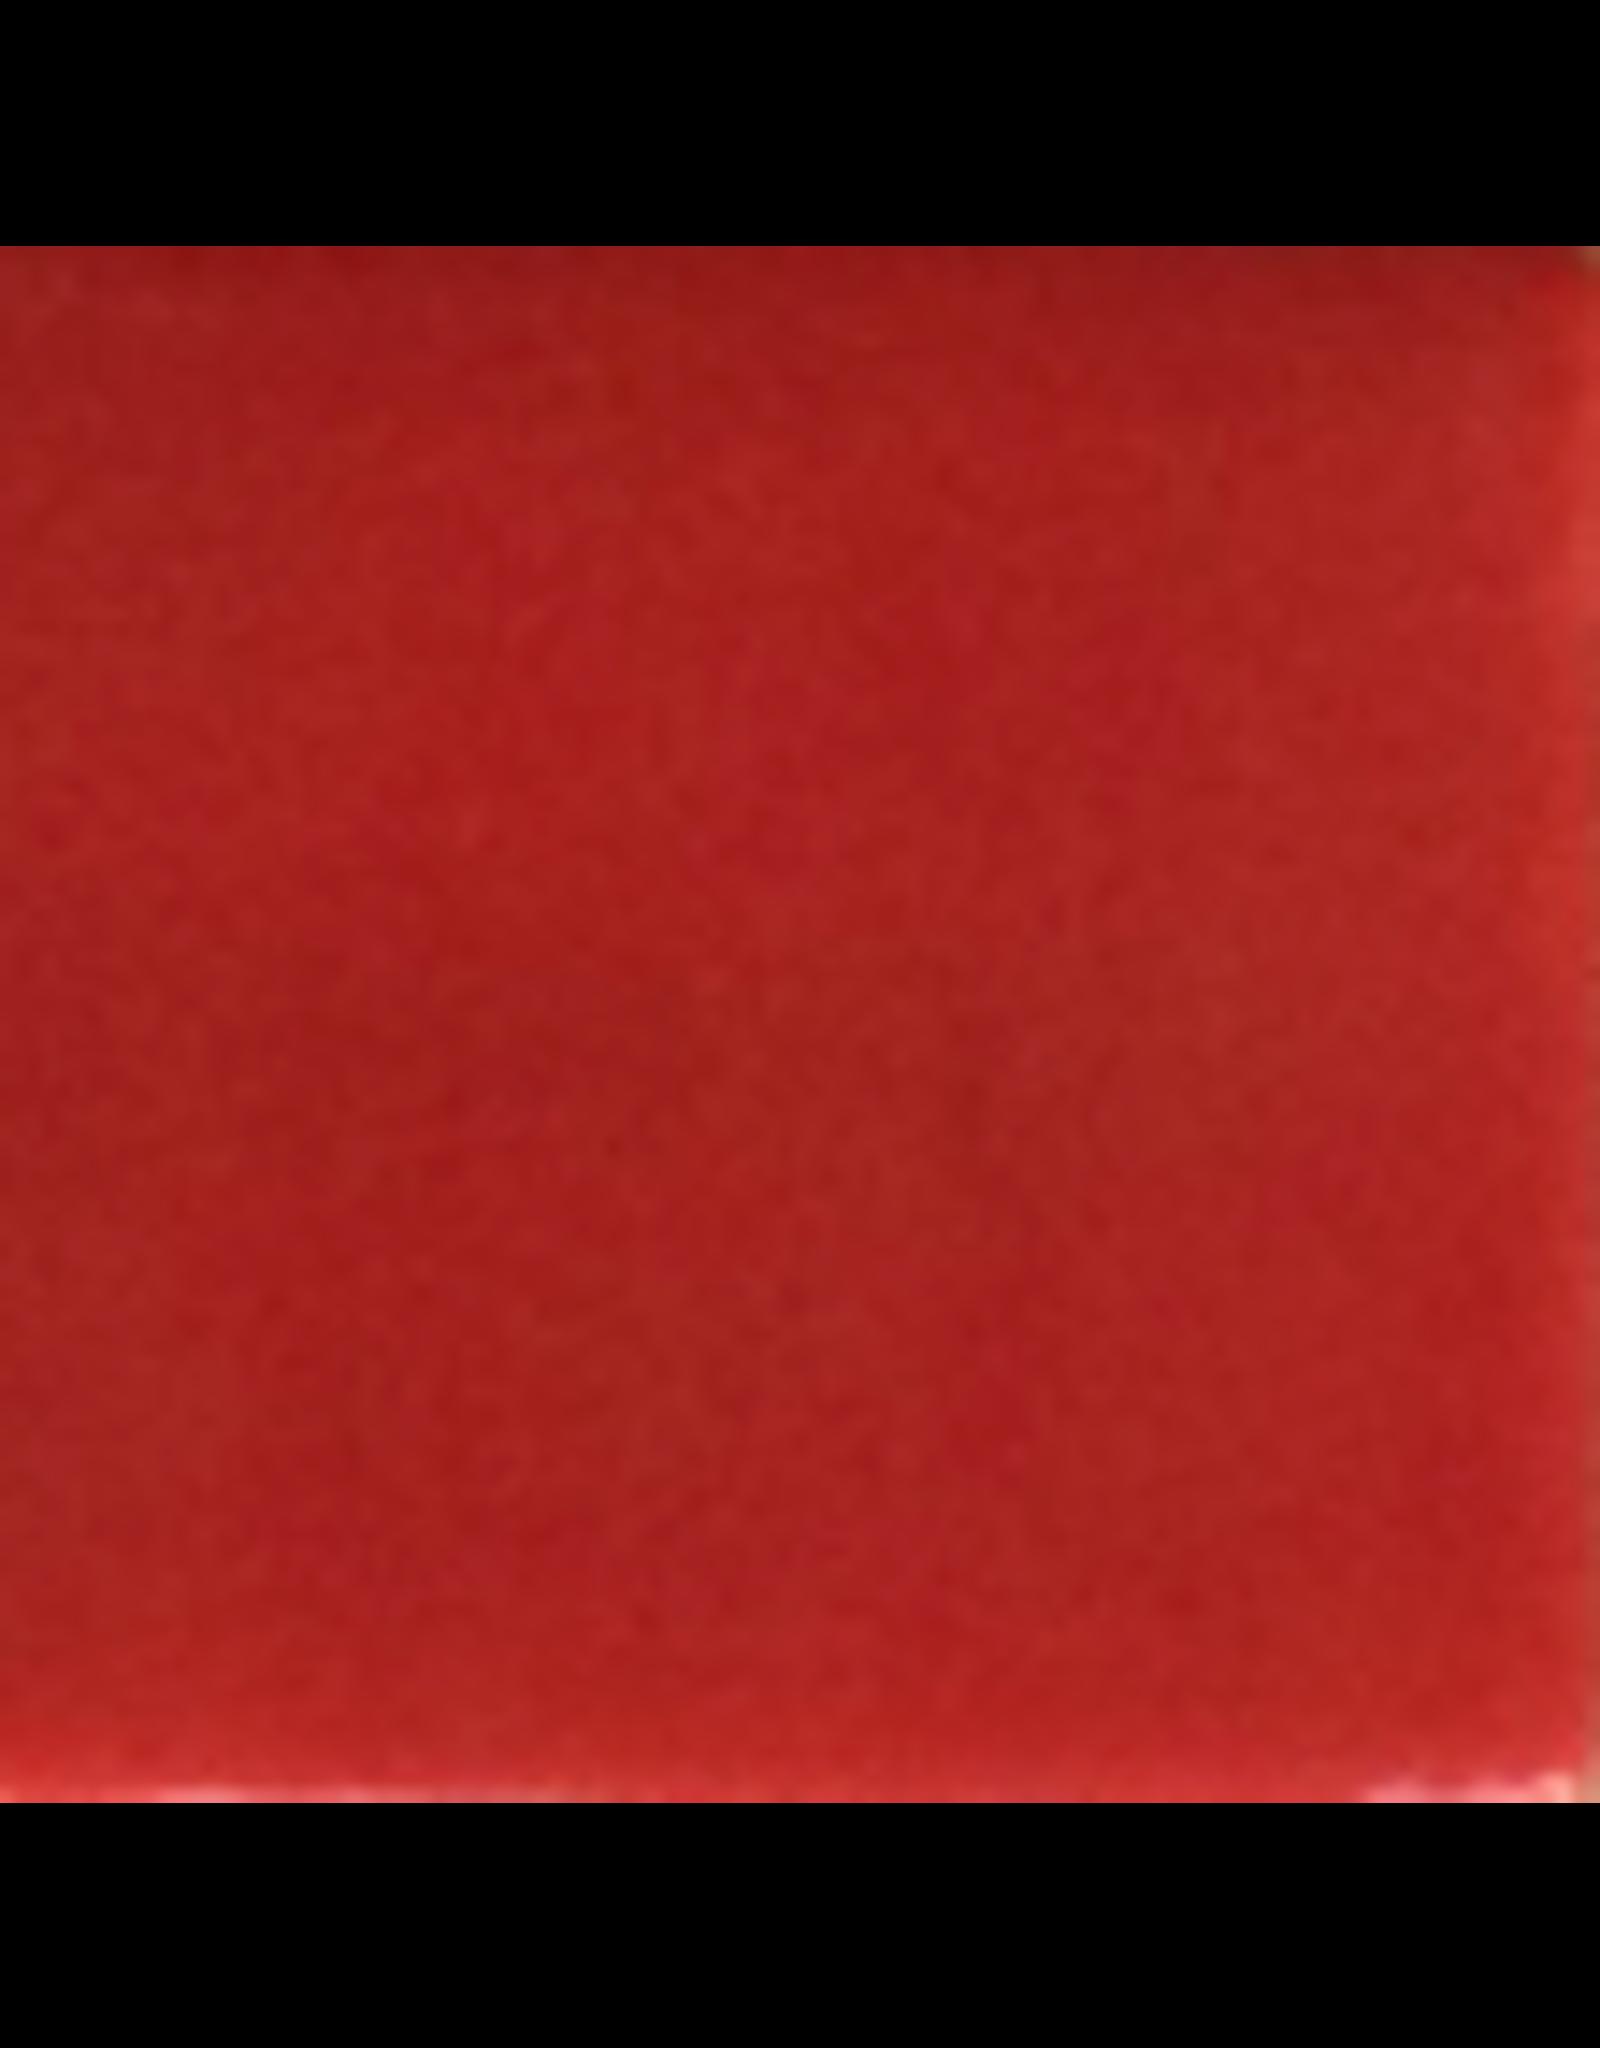 Contem UG17 Cardinal Red Underglaze